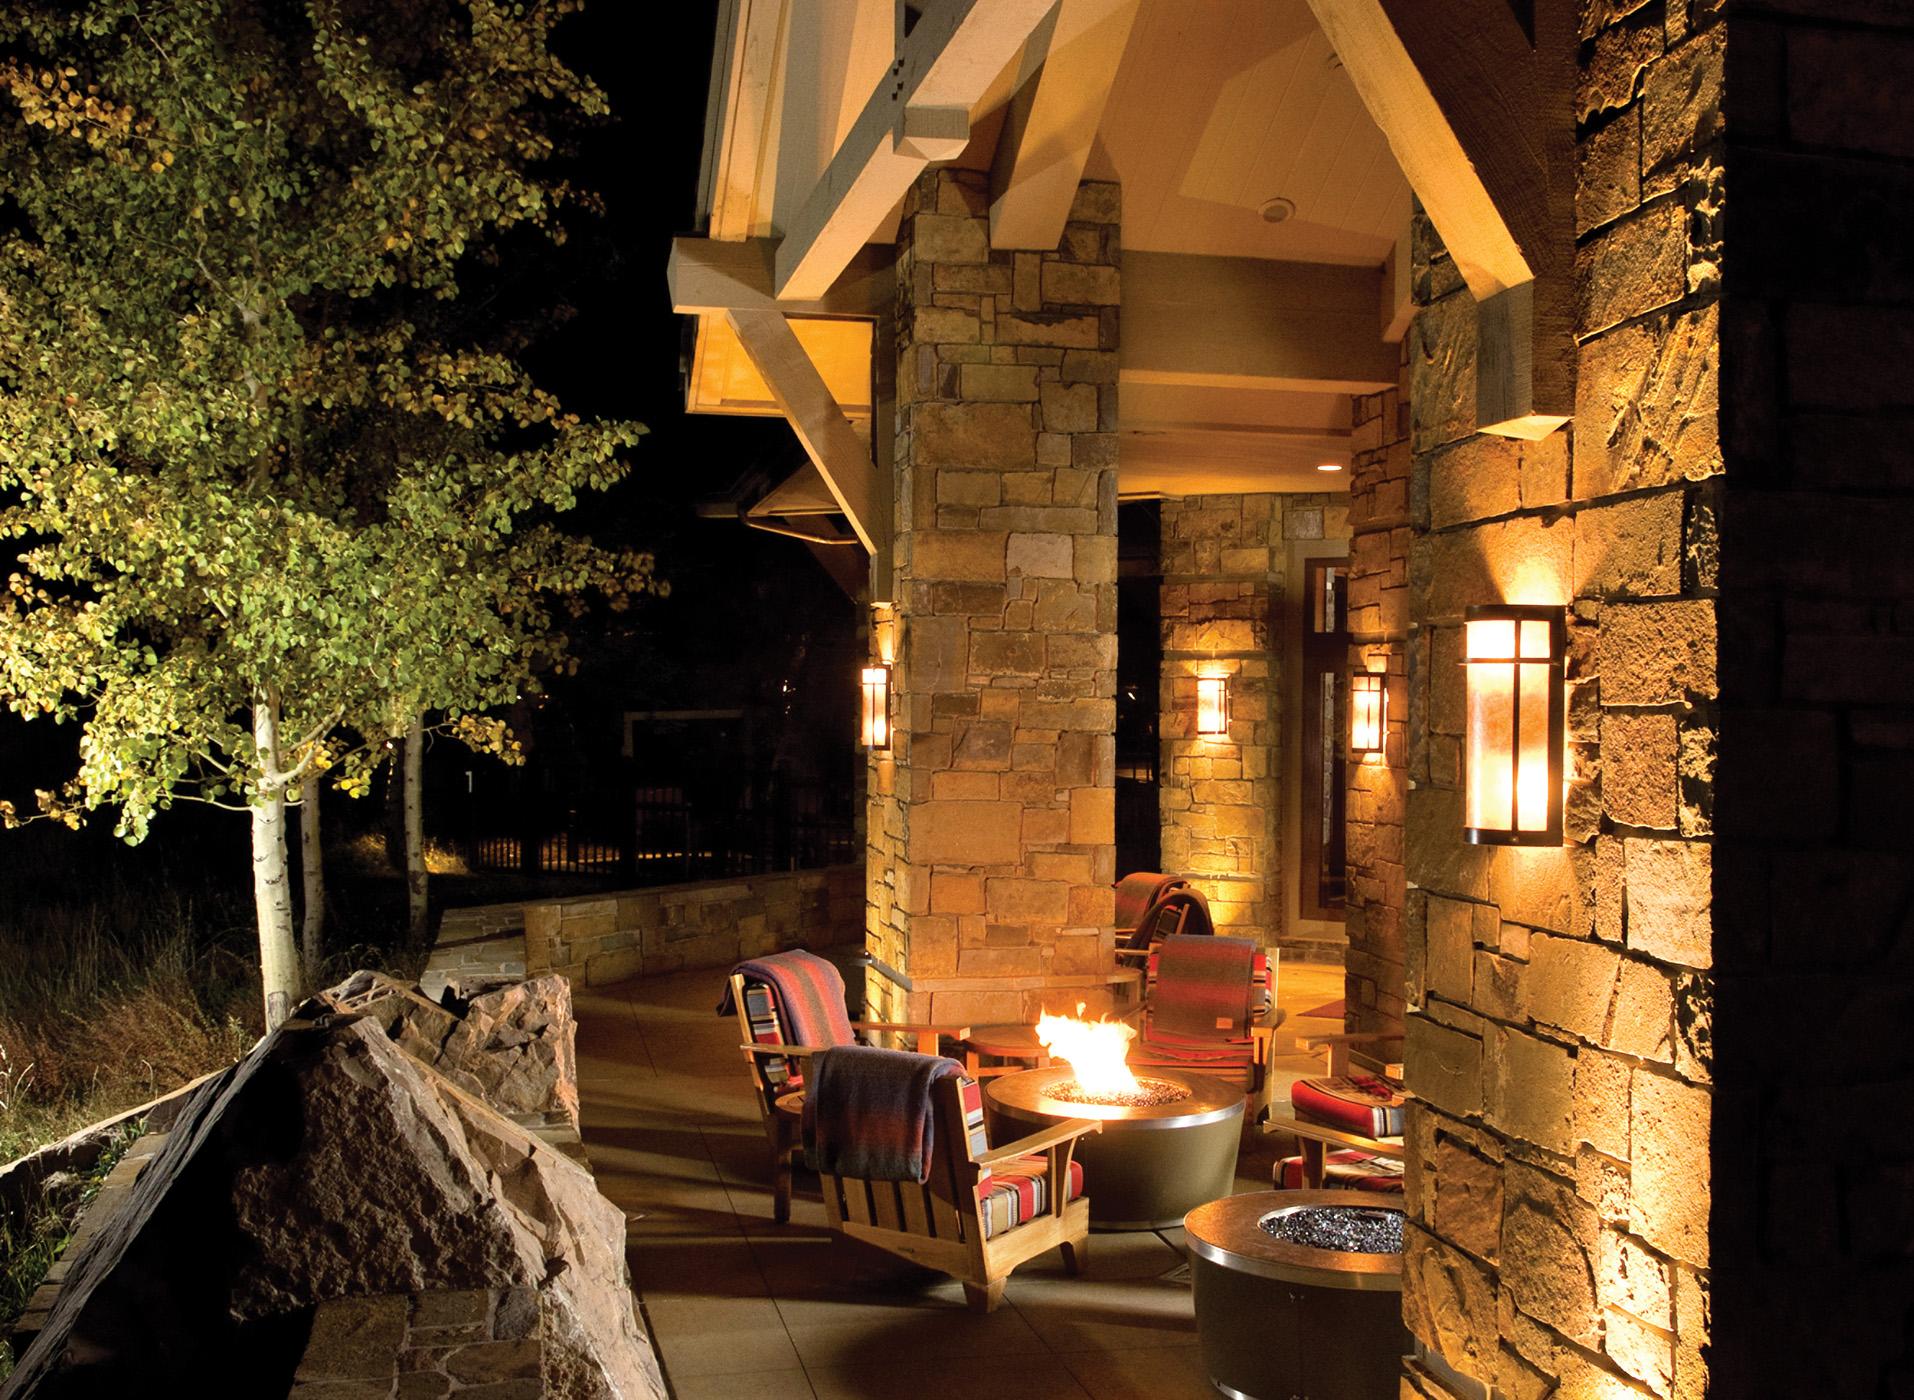 Condomínio para Venda às Four Seasons Residence Club Ownership 7680 Granite Loop #751 Teton Village, Wyoming 83025 Estados Unidos